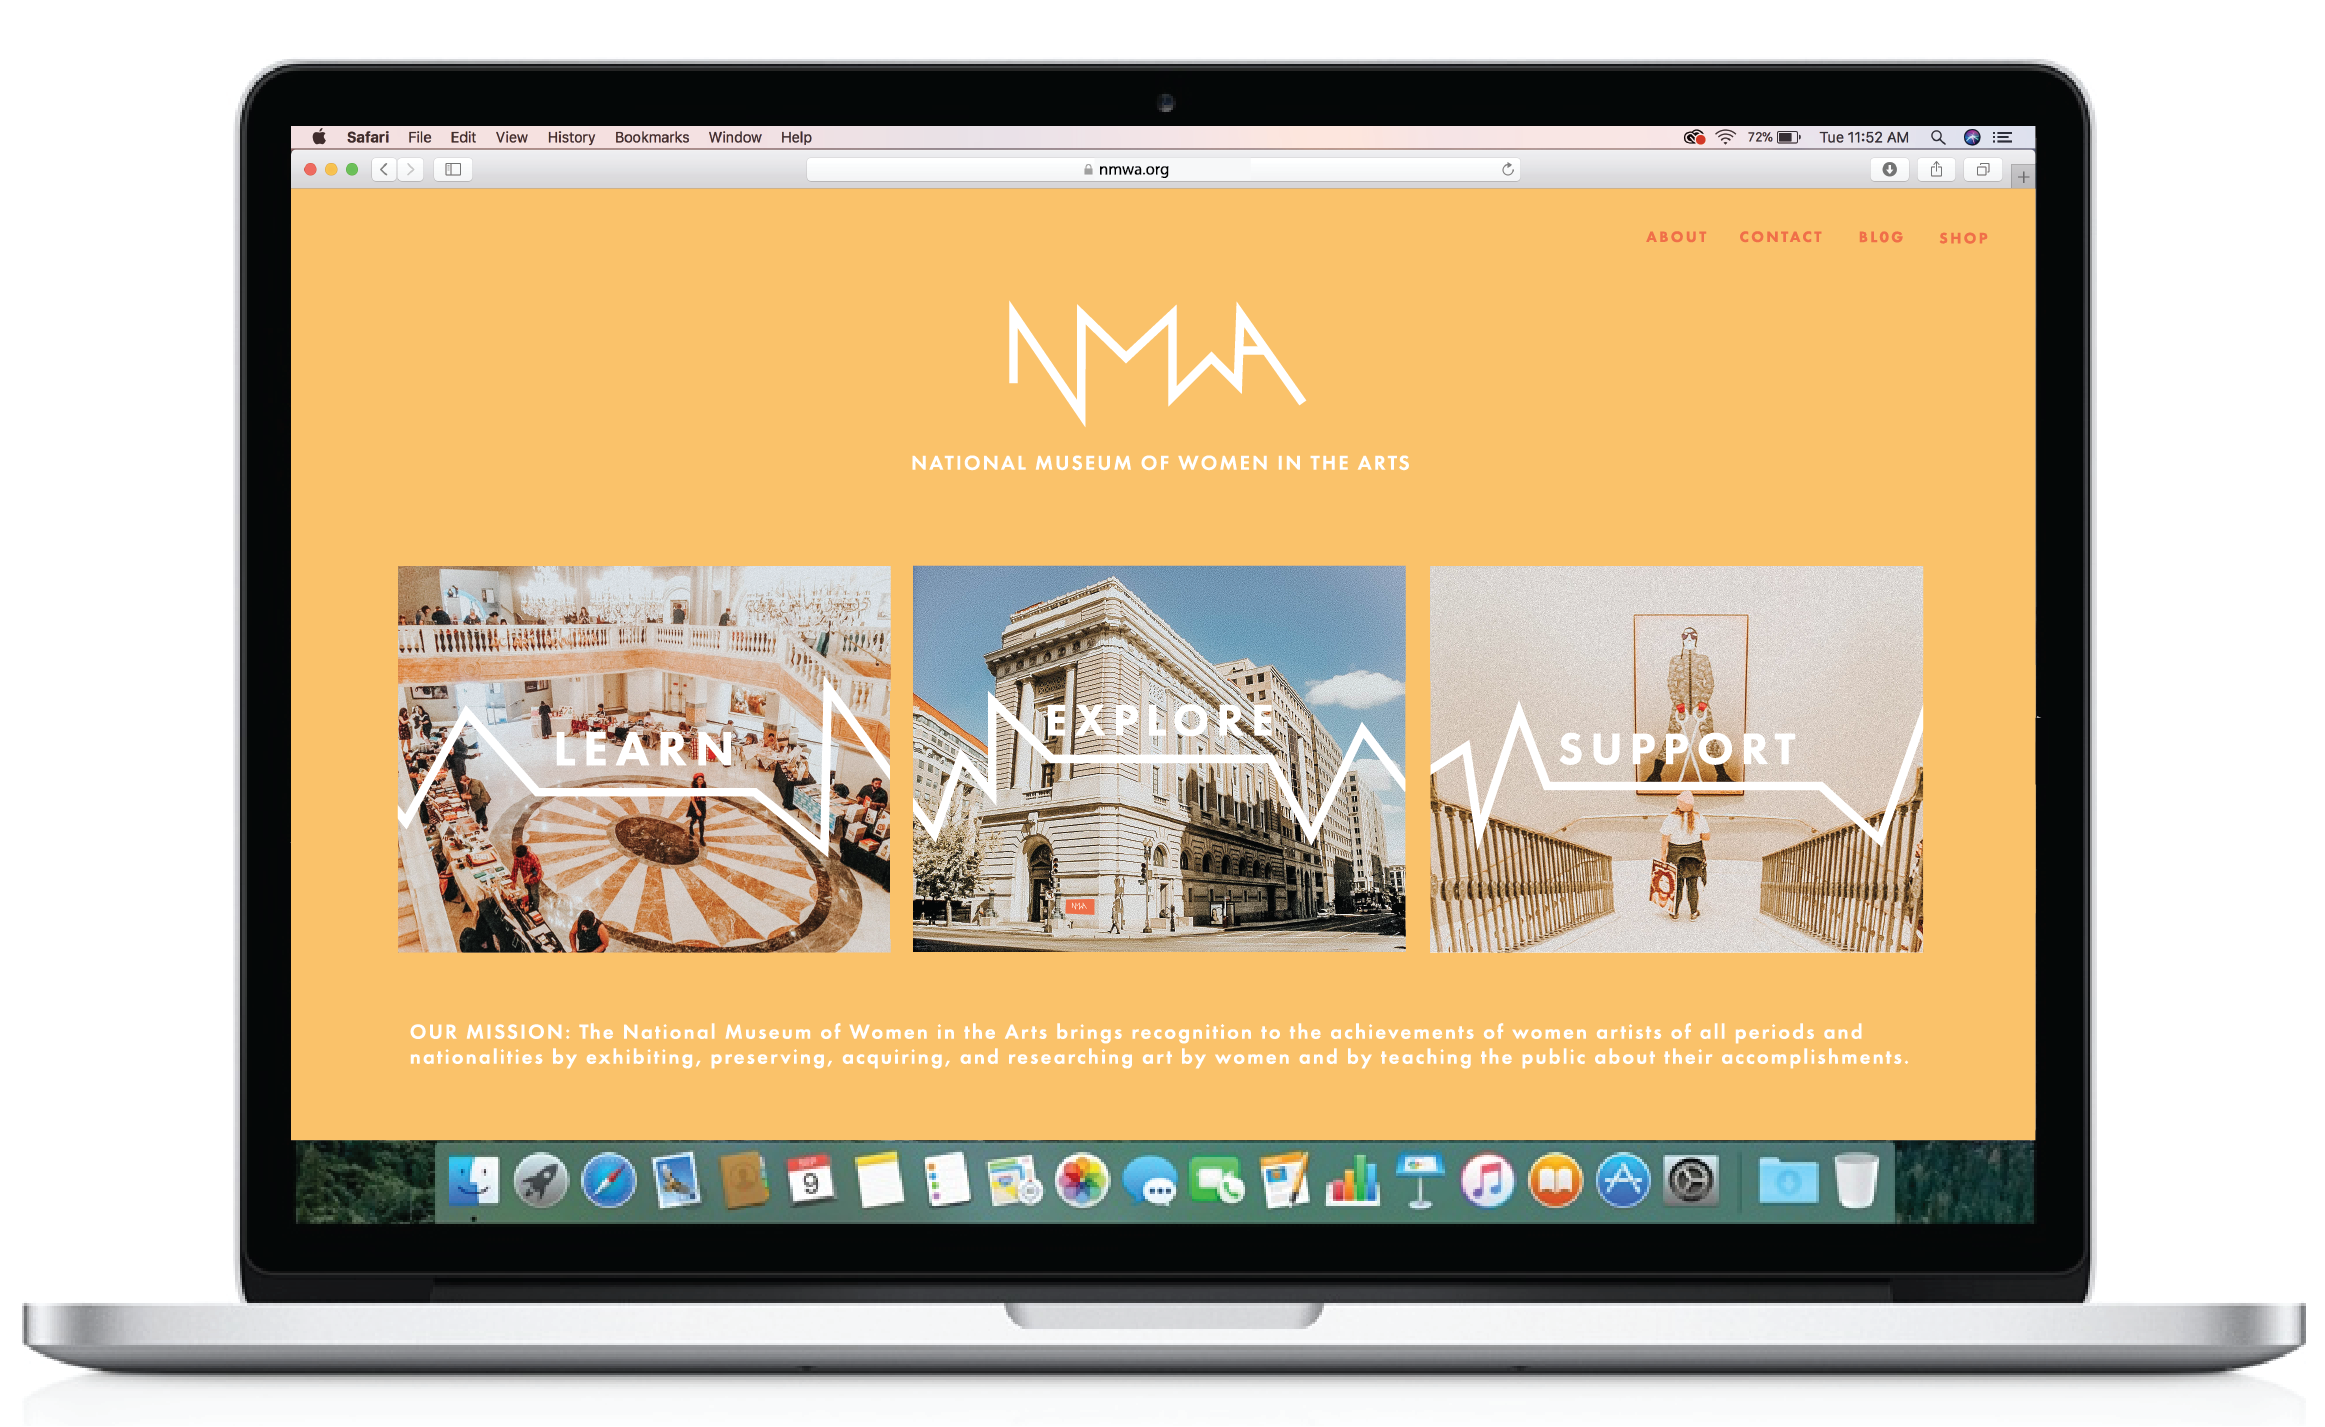 NMWA_applications-18.png